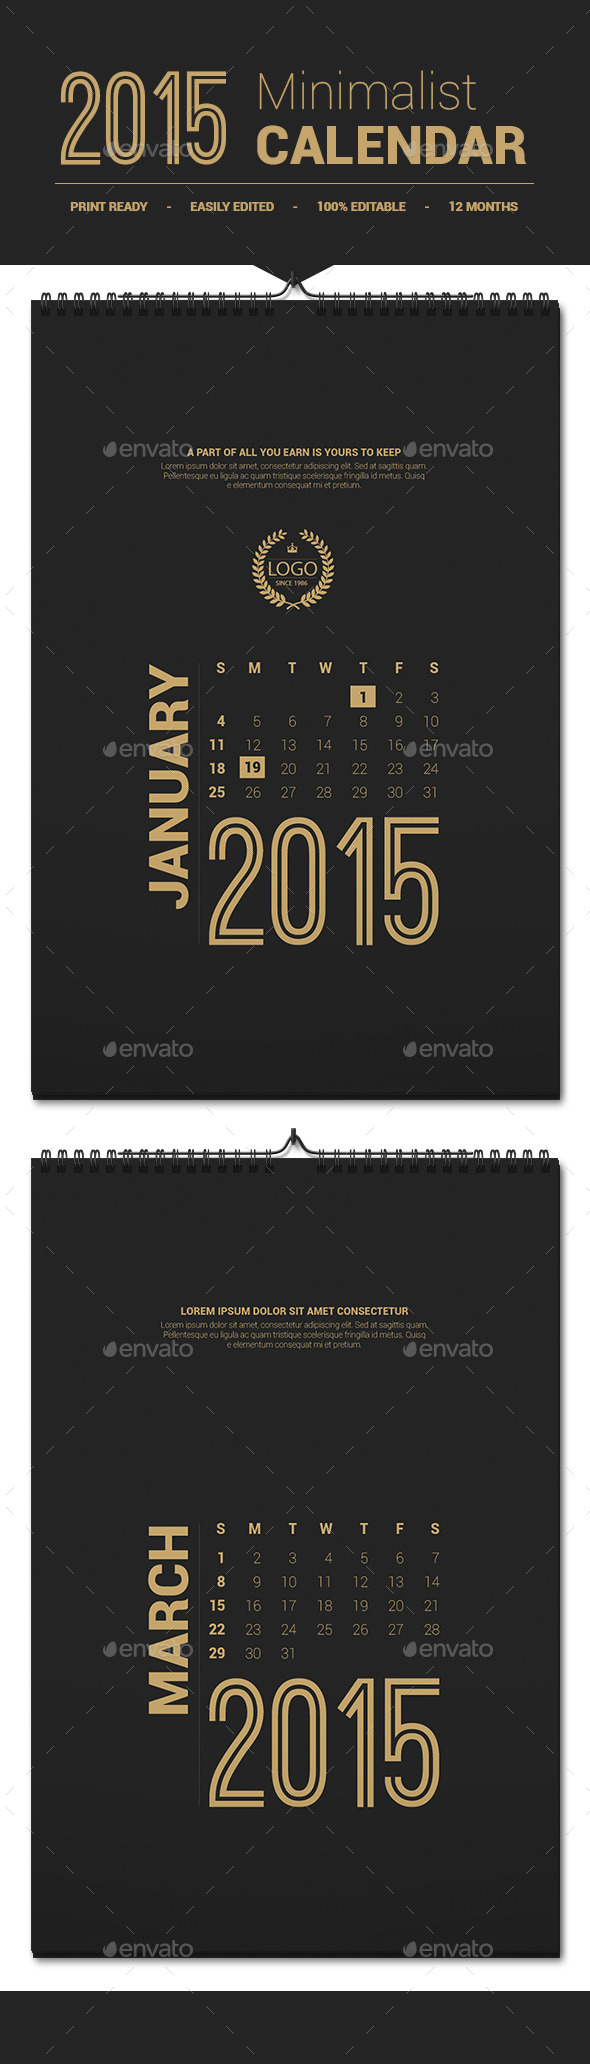 GraphicRiver Minimalist Calendar Template 2015 9942631